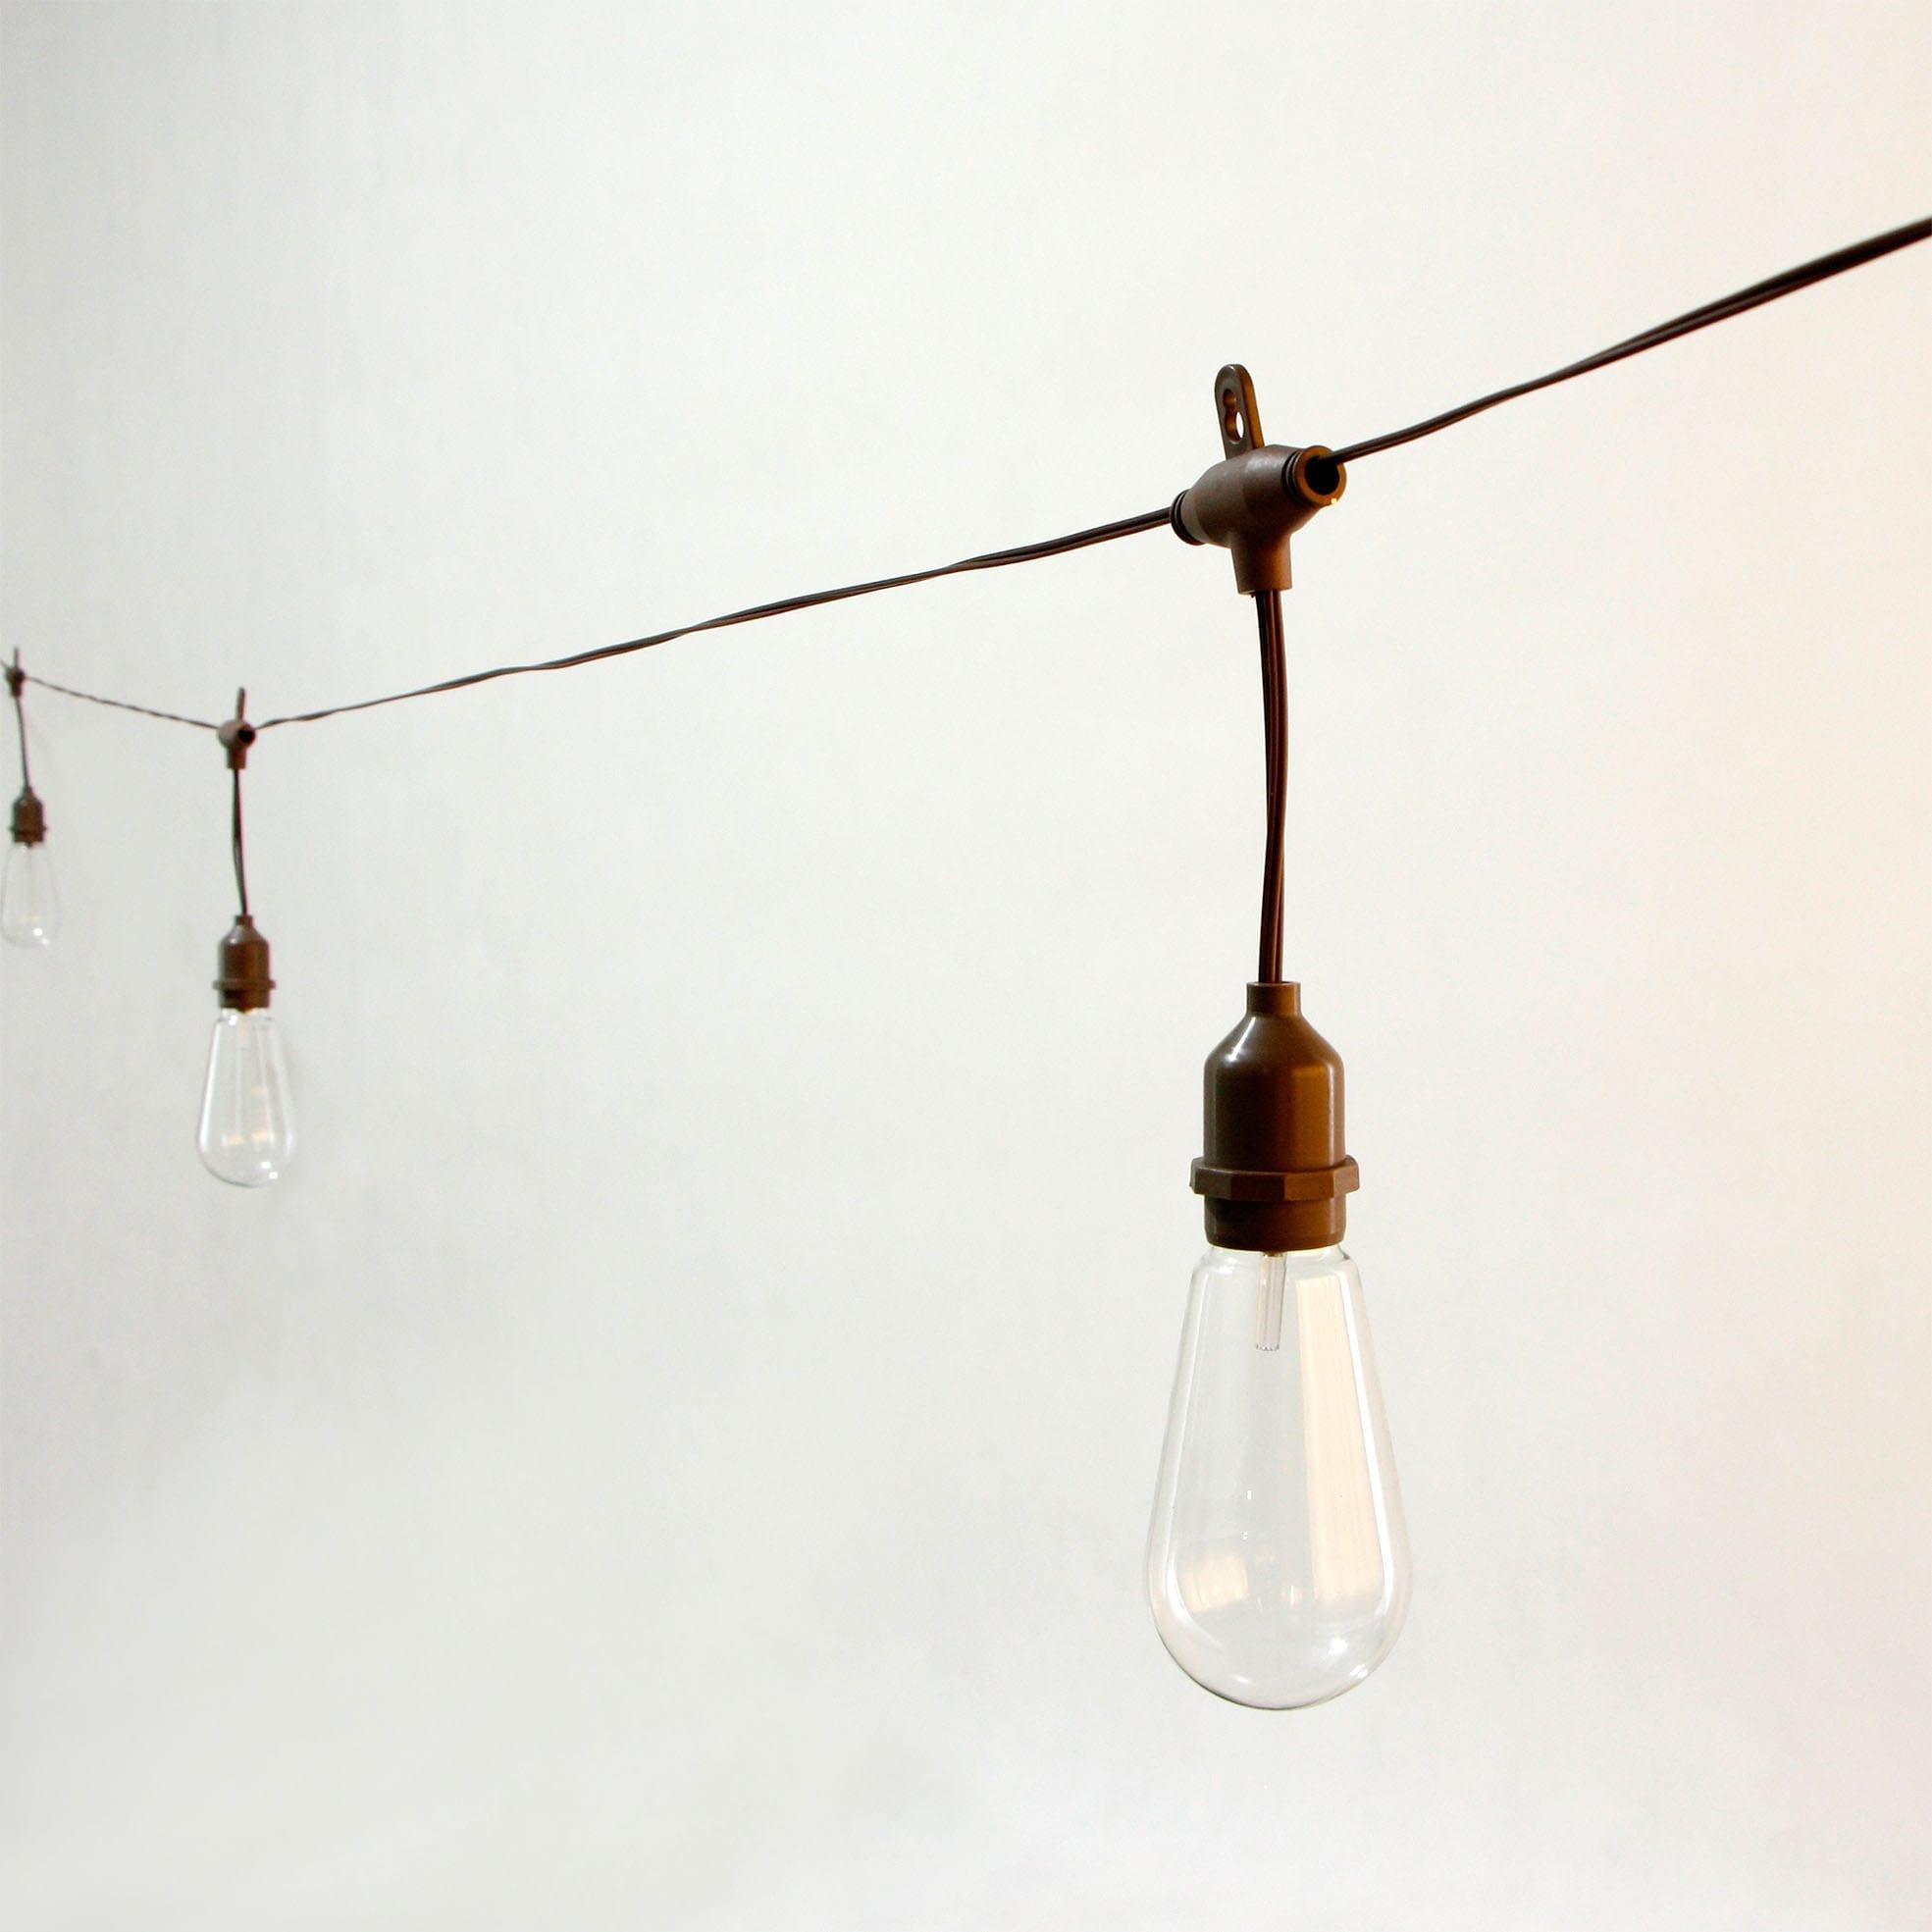 Matt Color Coated Steel Coil Edison String Lights - Decorative Umbrella Lights  MYHH09064-SO(C)  – Zhongxin